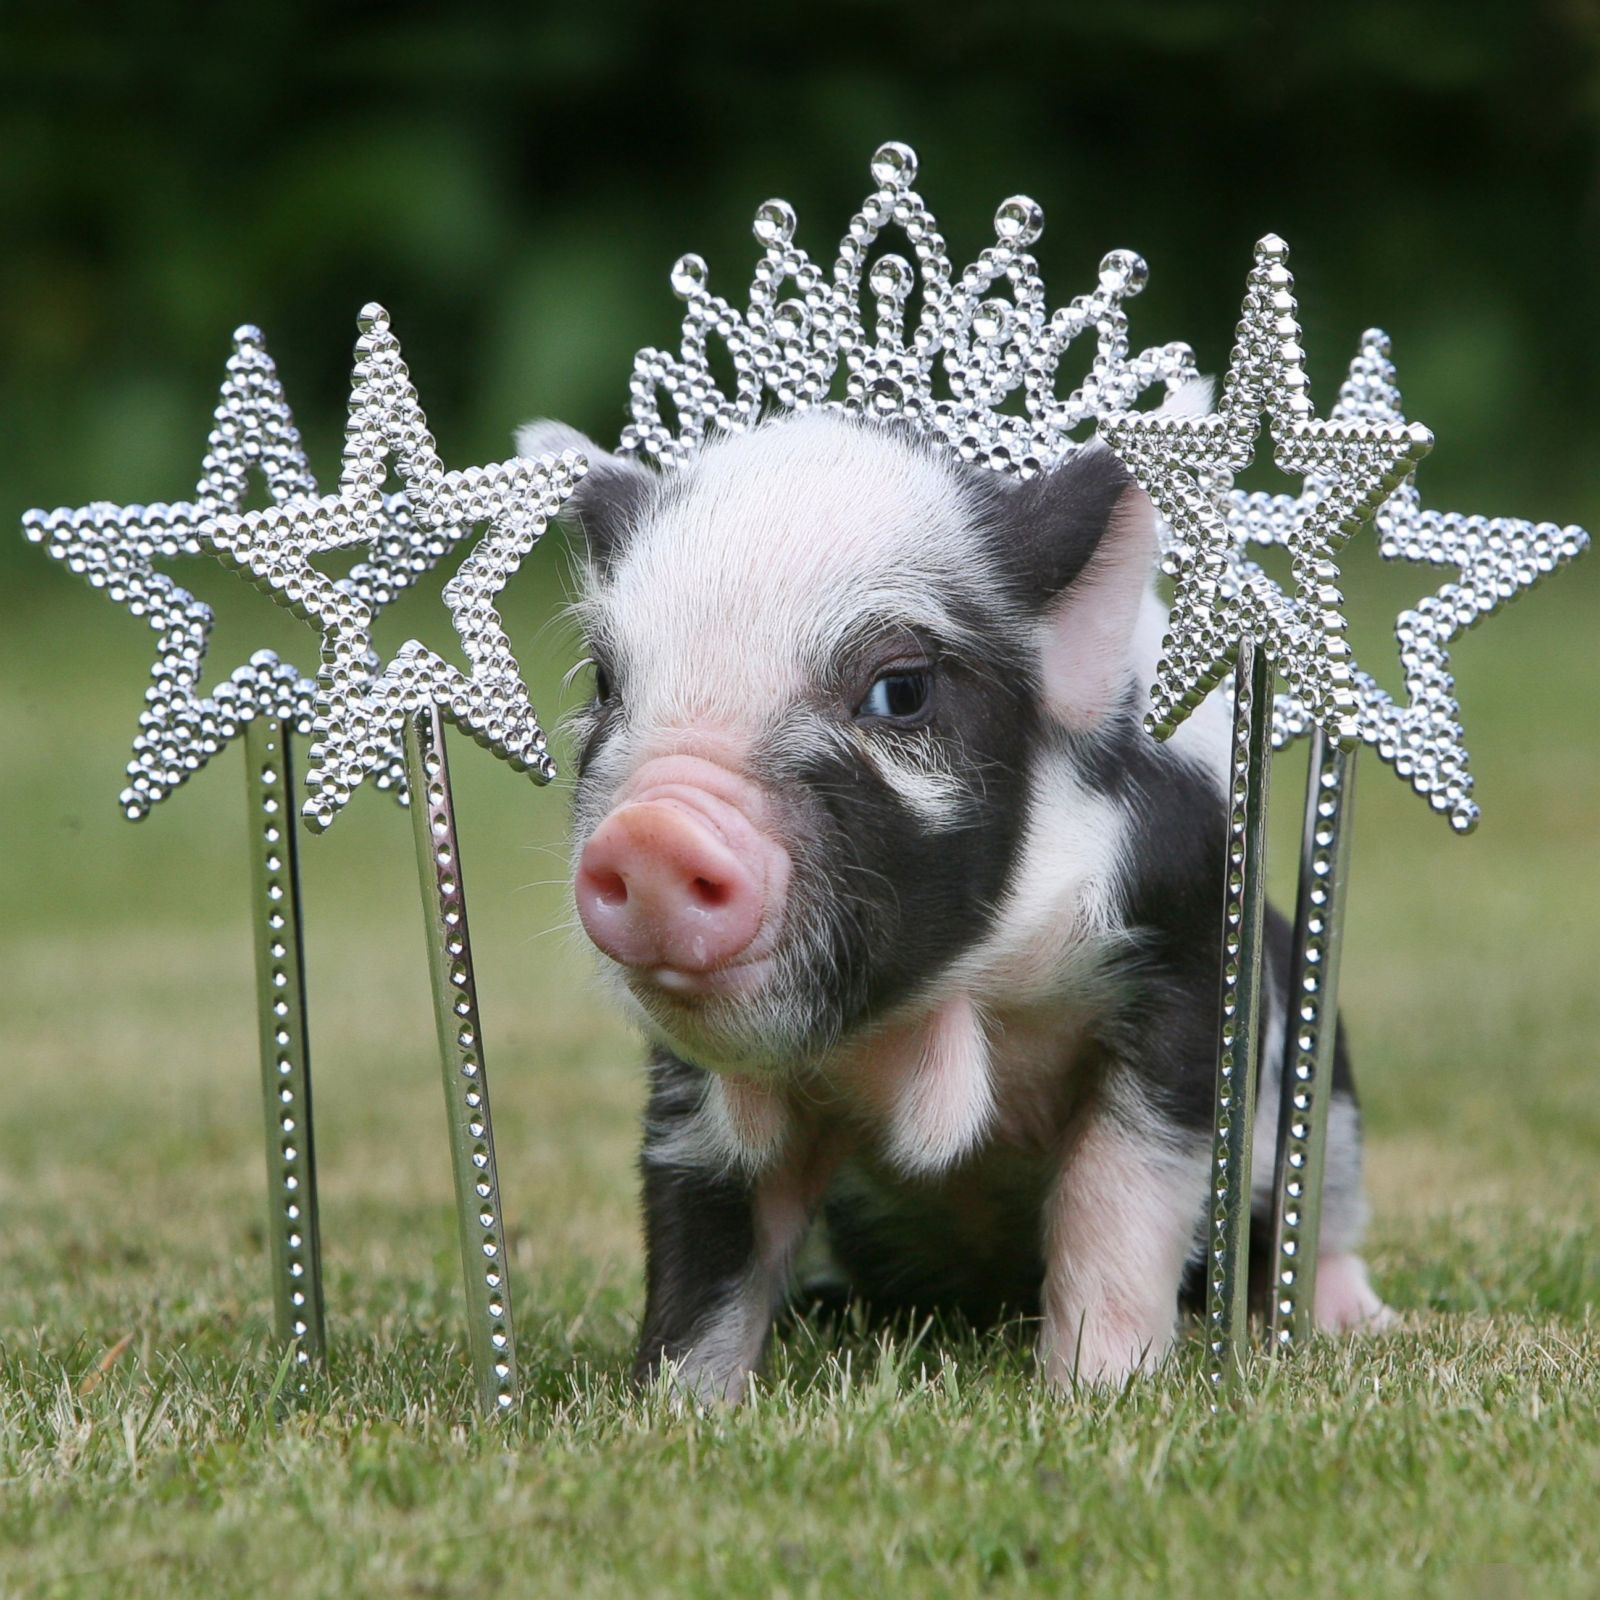 micro pig adorable pigs cute mini miniature funny piggy piglets piglet dwarf micropig pretty die birthday tiara ever